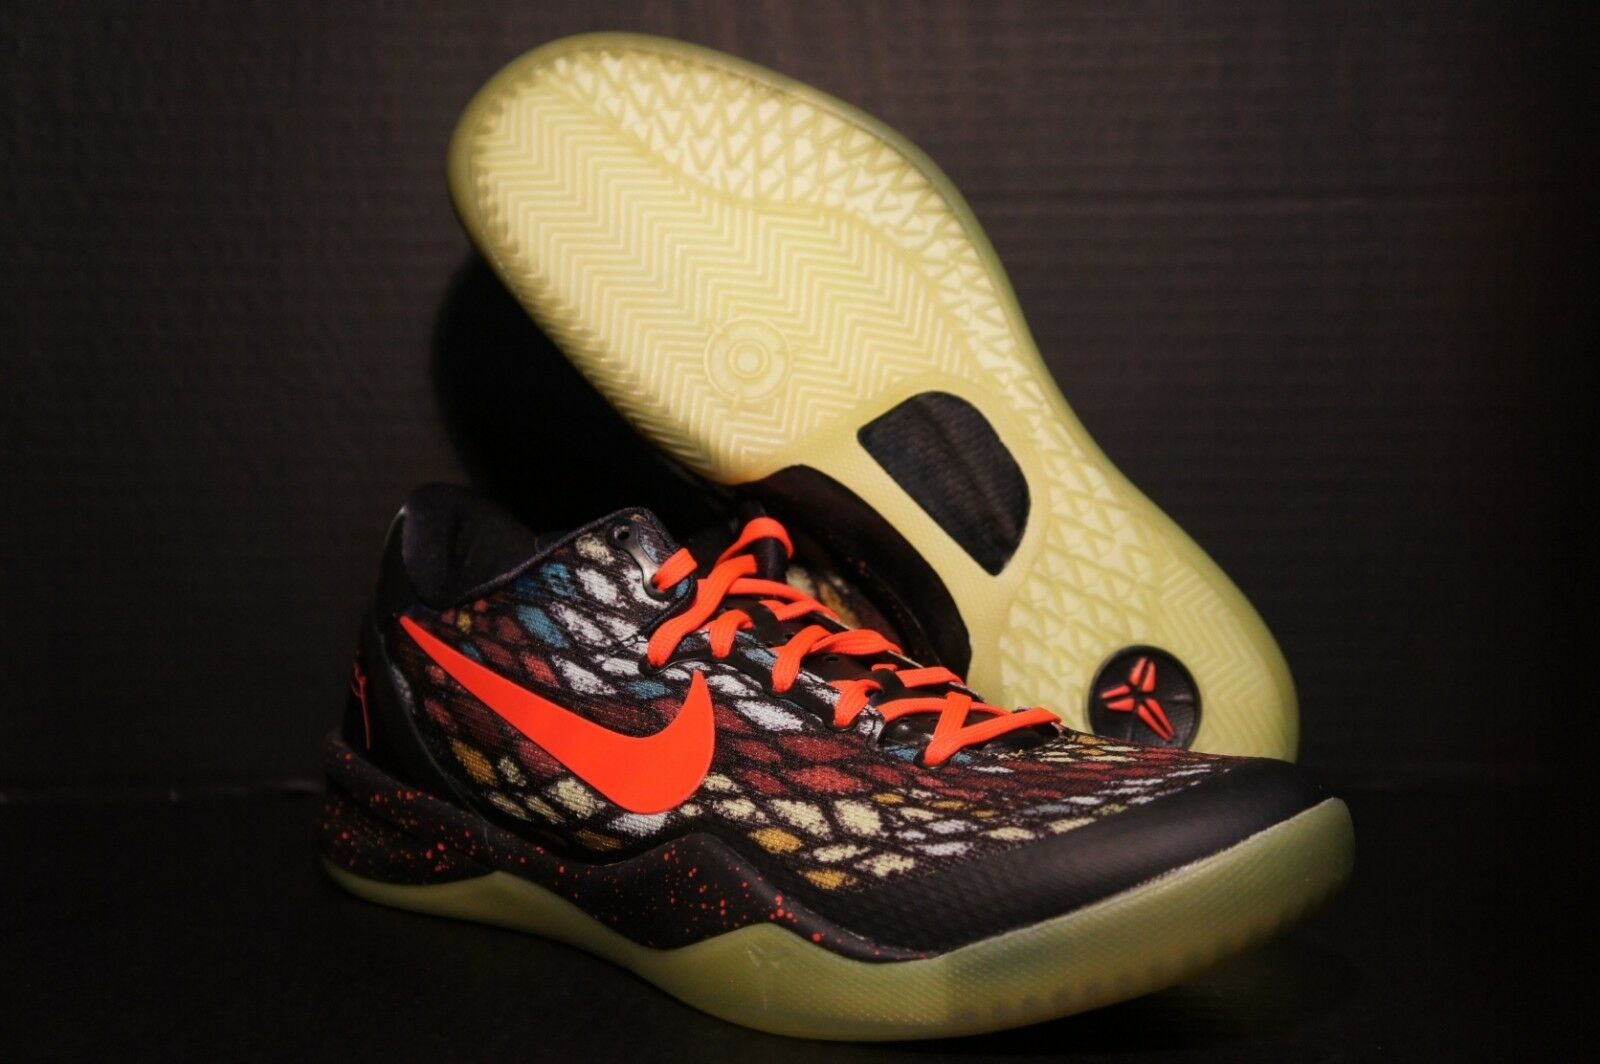 Nike Kobe 8 VIII Christmas Xmas 2012 555035 030 Size 9.5 and 10 PLEASE READ